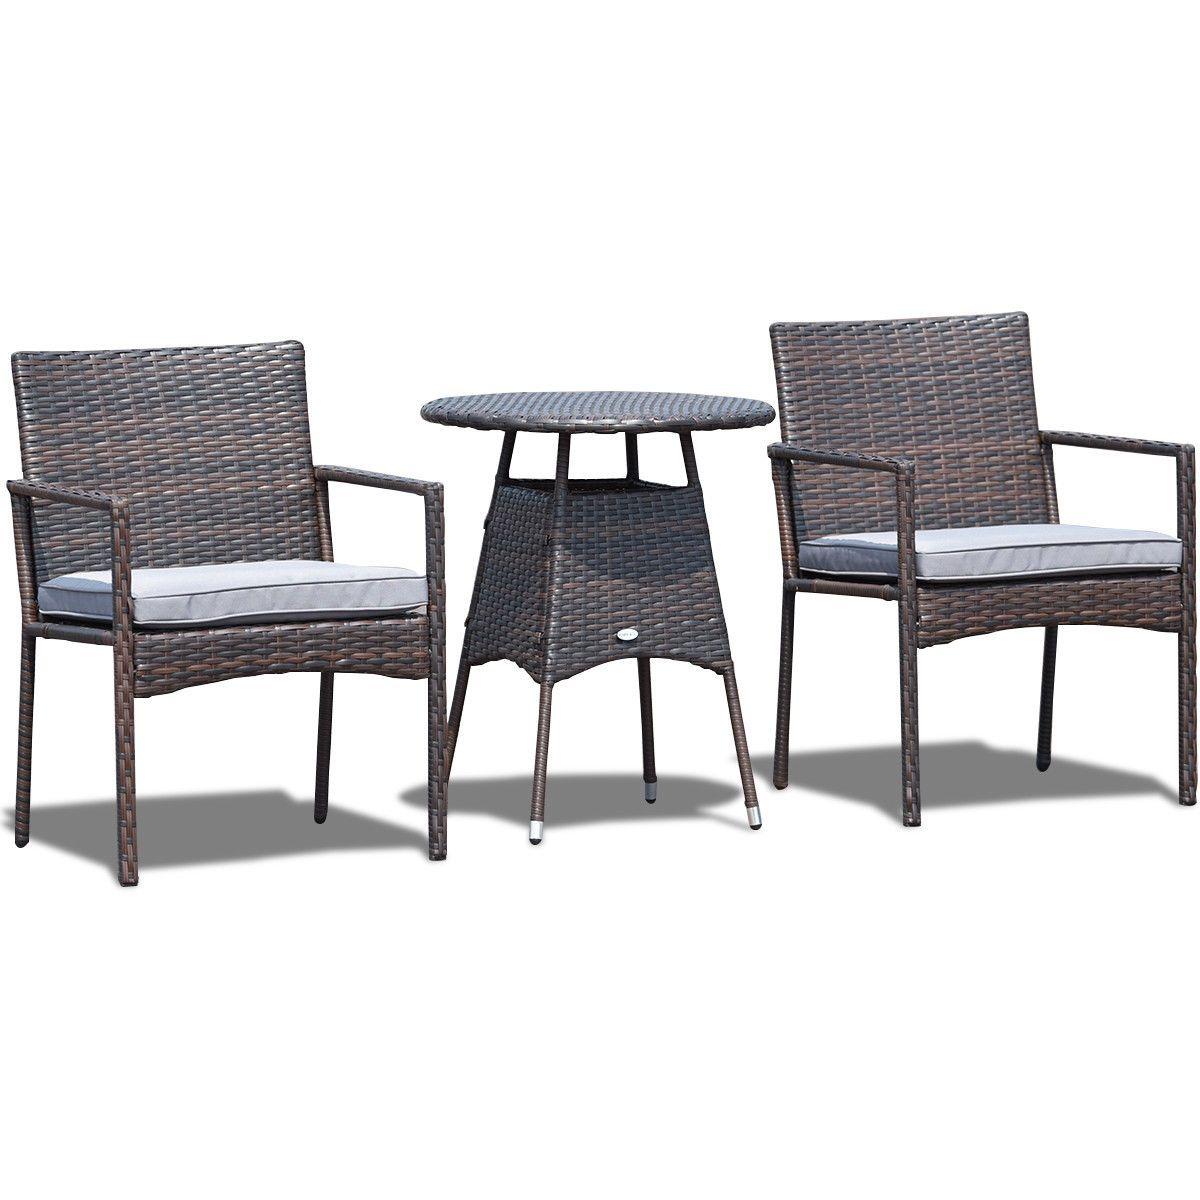 3 Pcs Outdoor Bistro Rattan Wicker Cushioned Seat Furniture Set Furniture Outdoor Furniture Sets Rattan Furniture